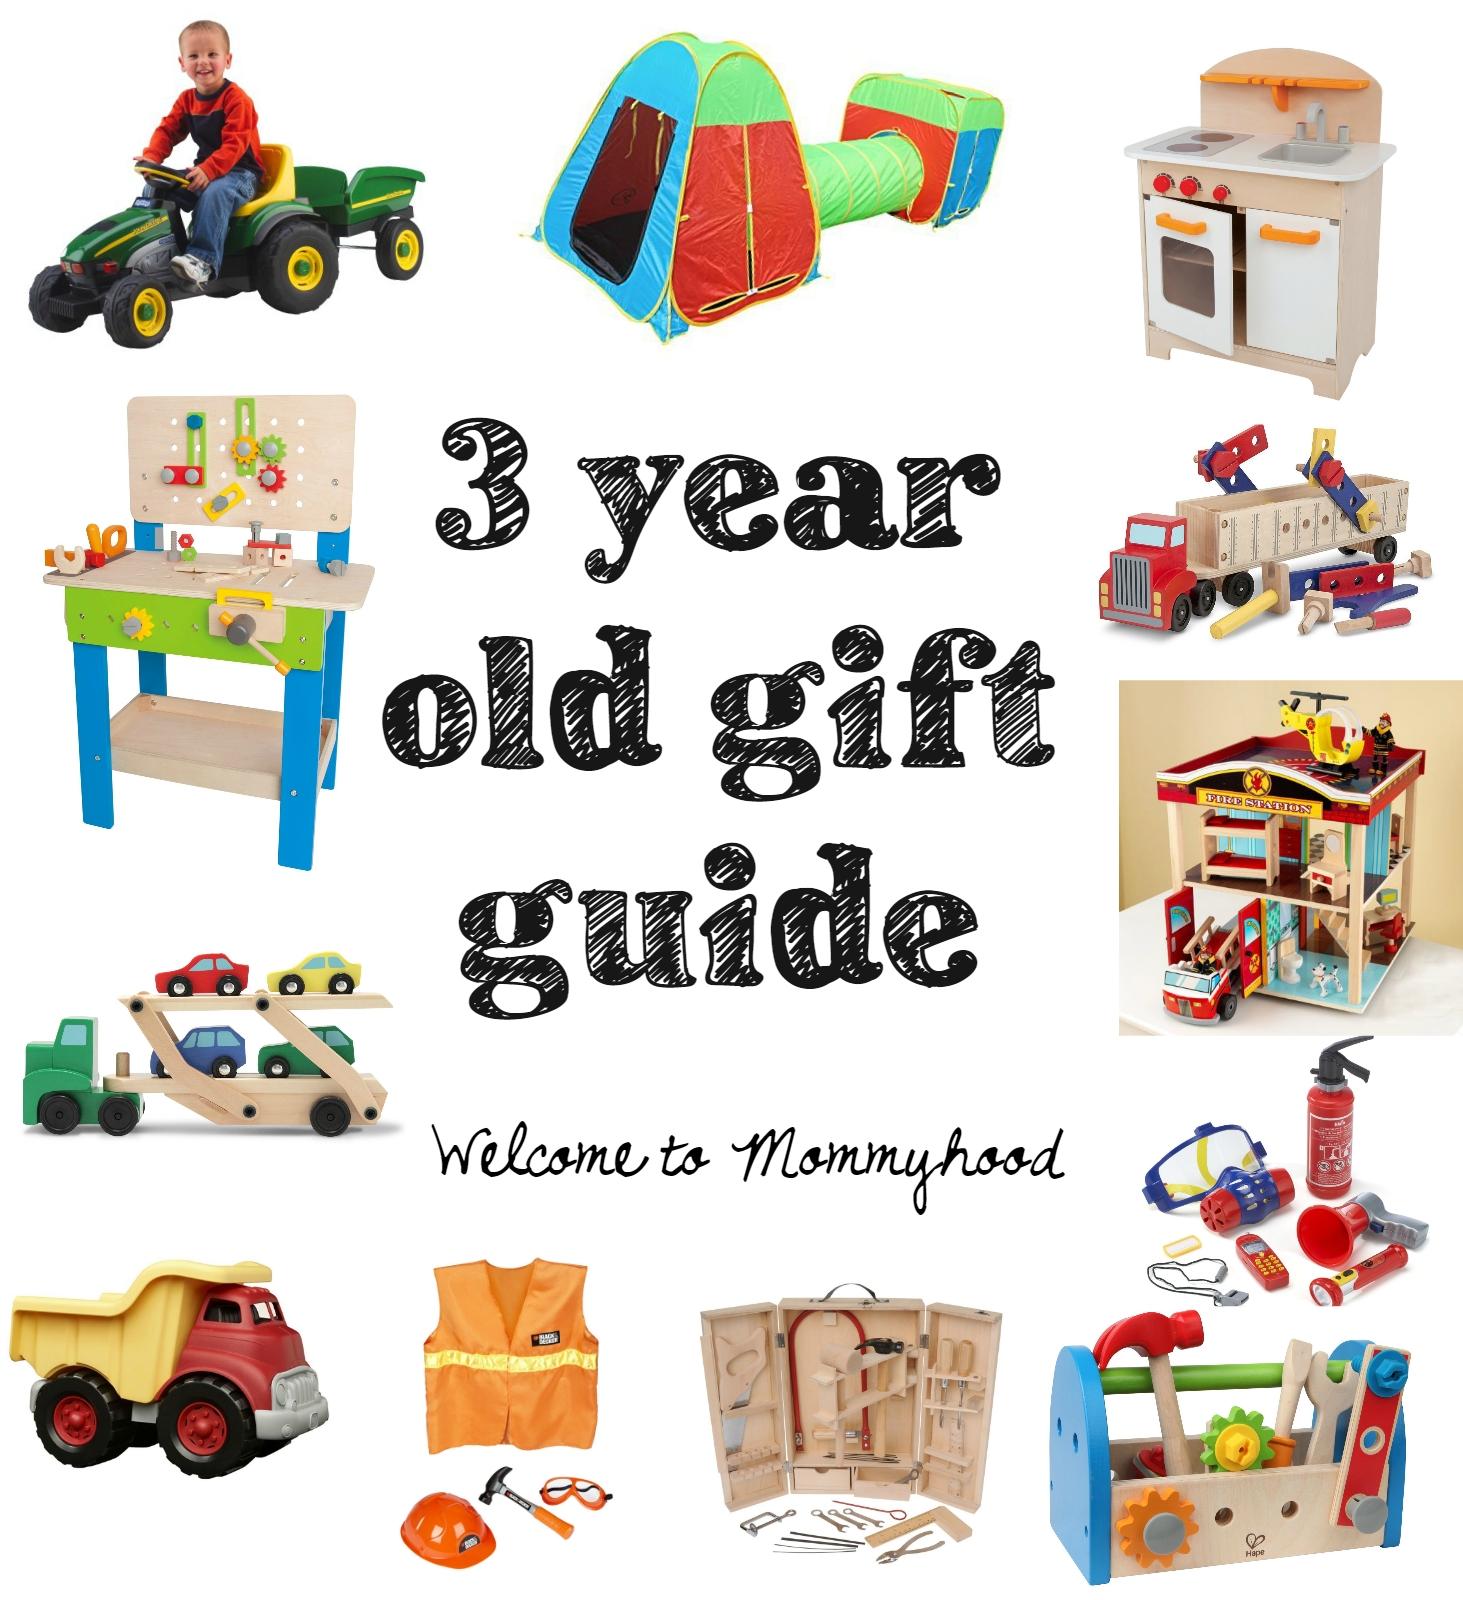 10 Beautiful 3 Year Old Boy Gift Ideas birthday gift ideas for a 3 year old third gift and birthdays 18 2020